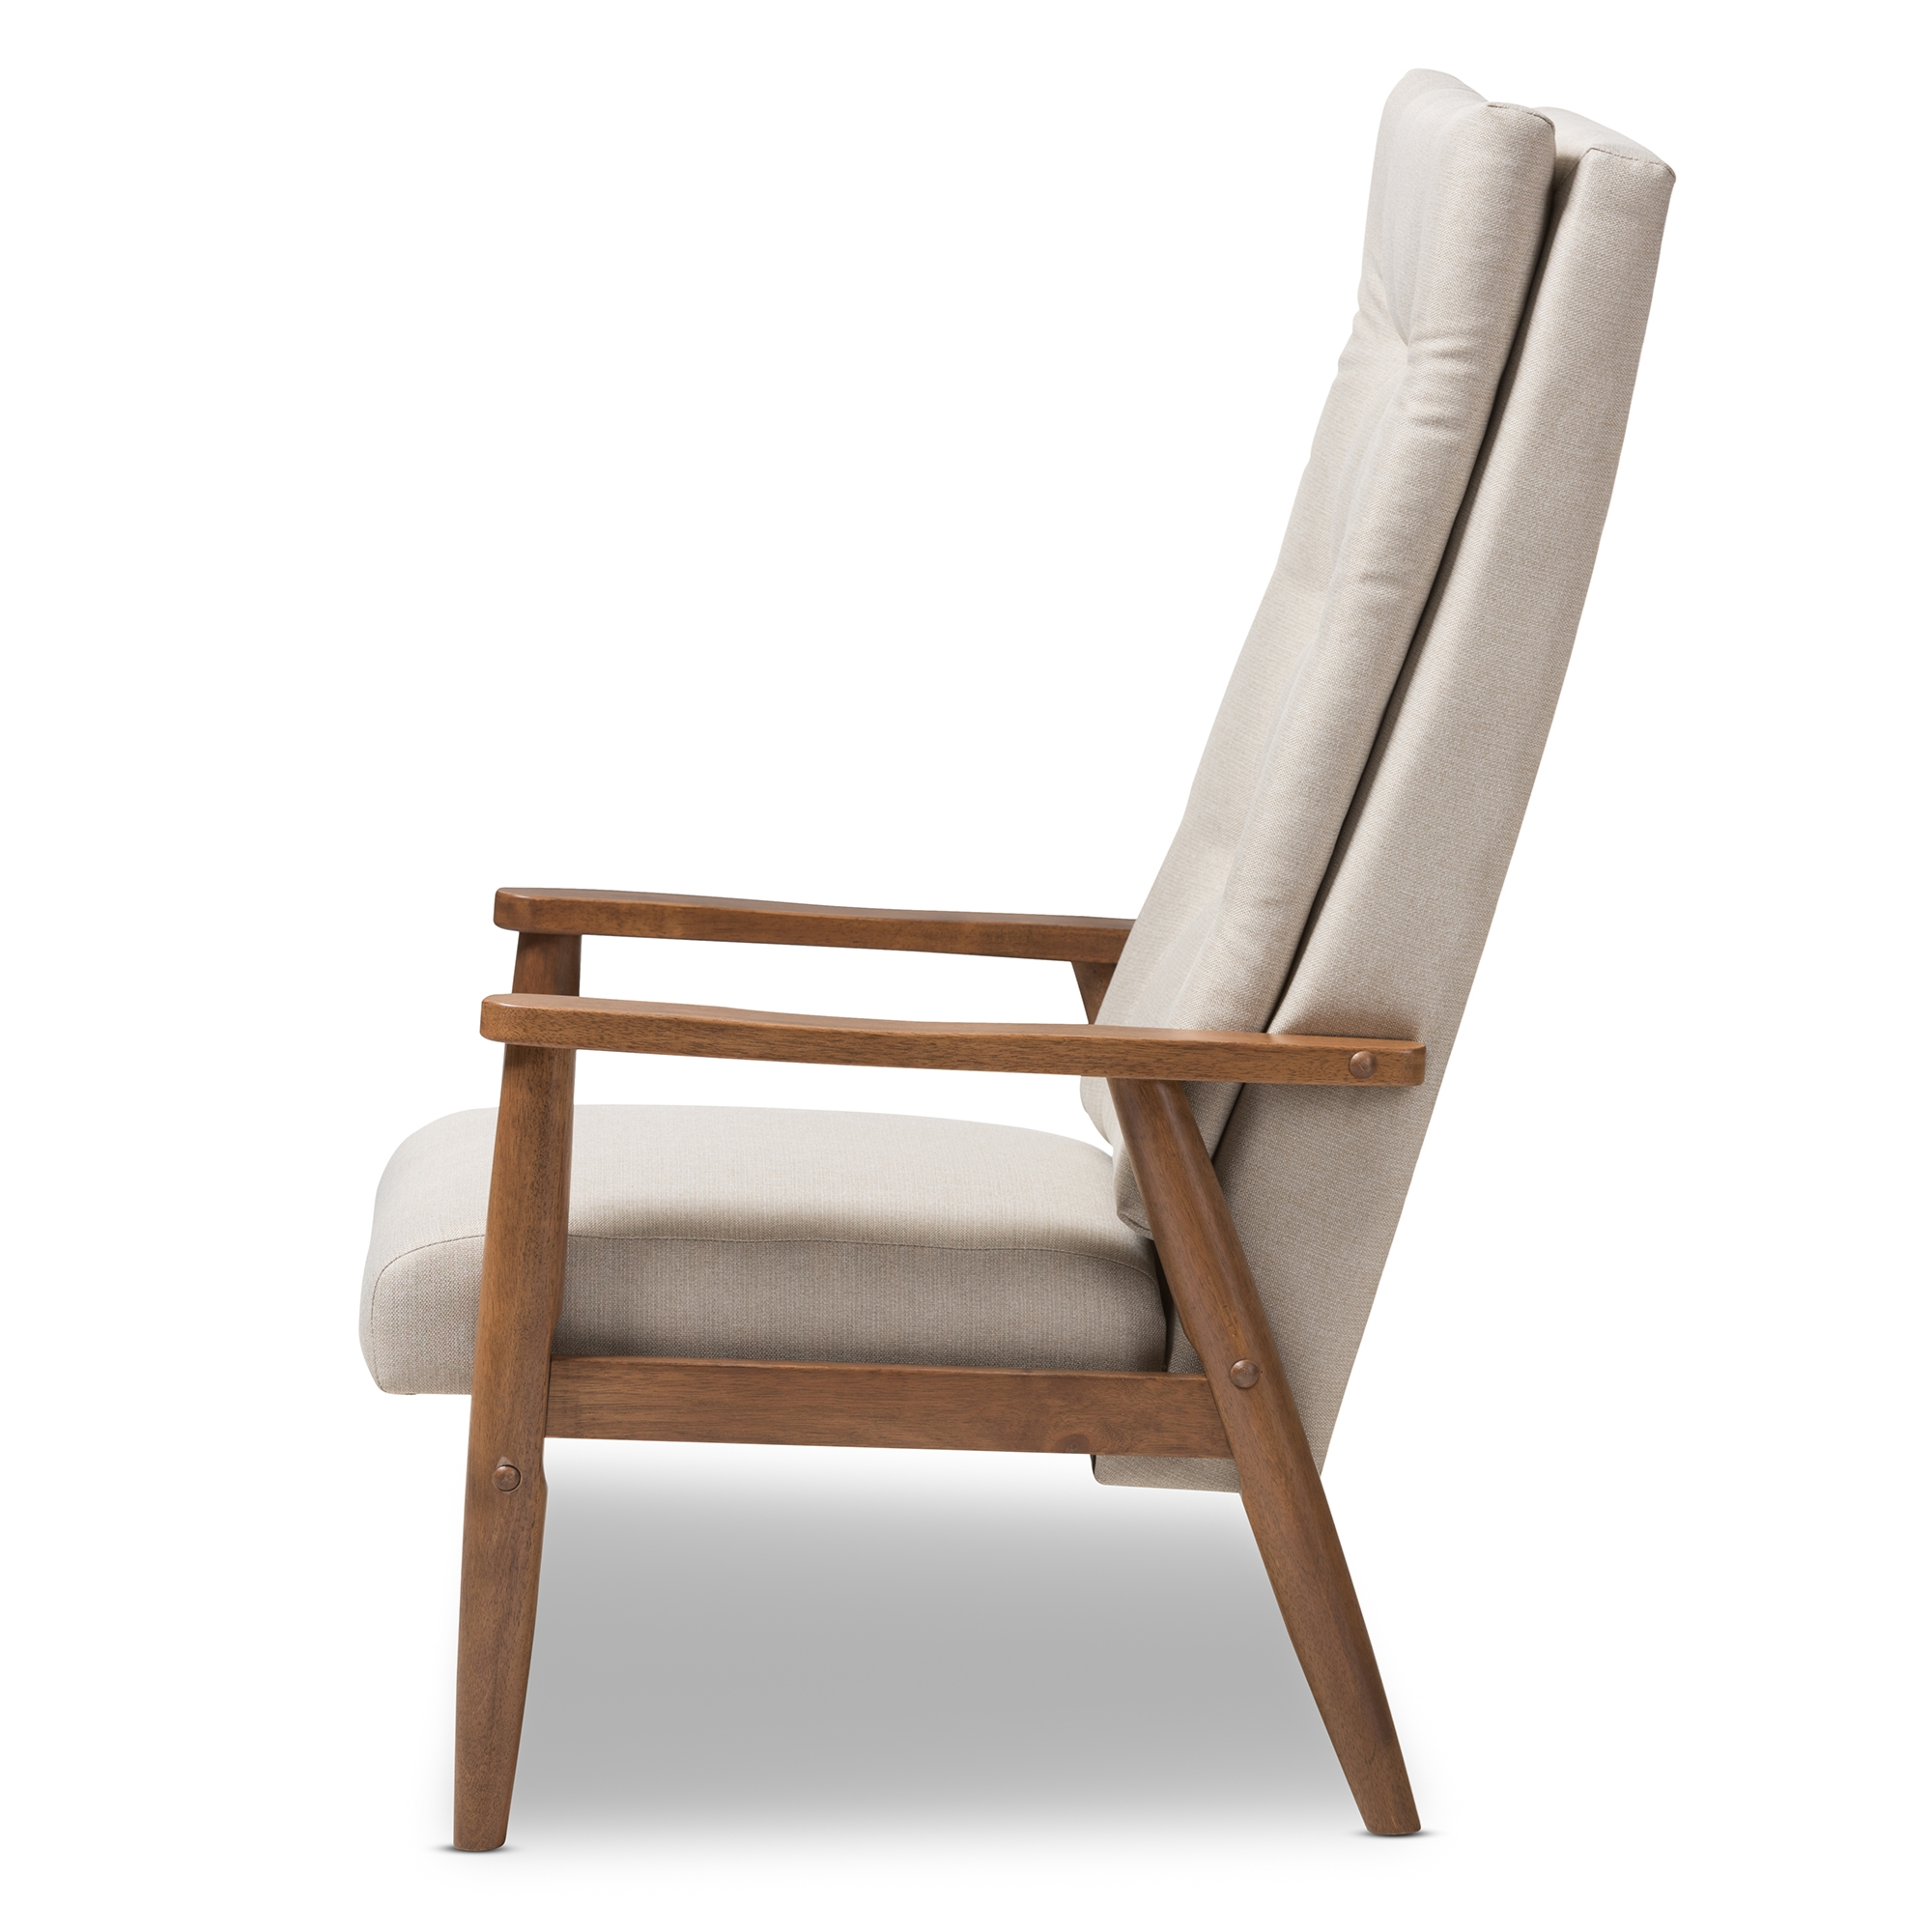 ... Baxton Studio Roxy Mid Century Modern Walnut Brown Finish Wood And  Light Beige Fabric Upholstered ...